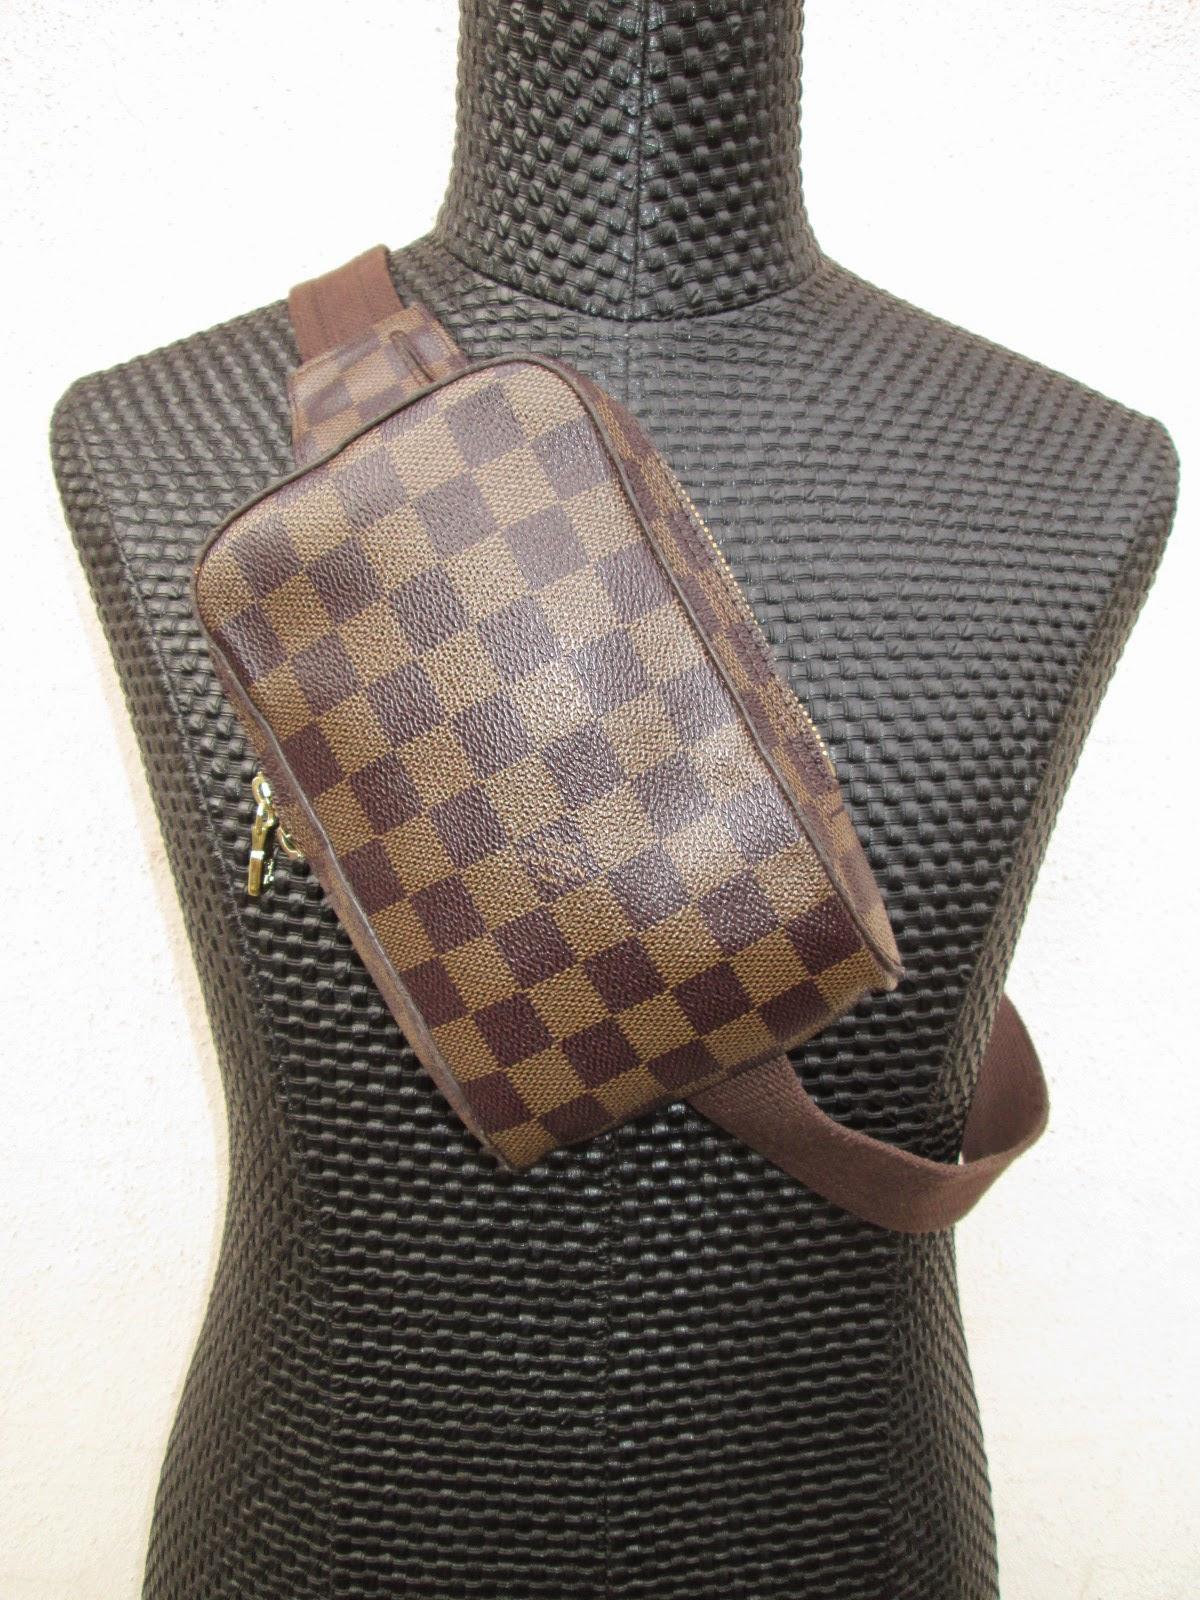 ae345af279d3 Louis Vuitton Belt Bag Replica